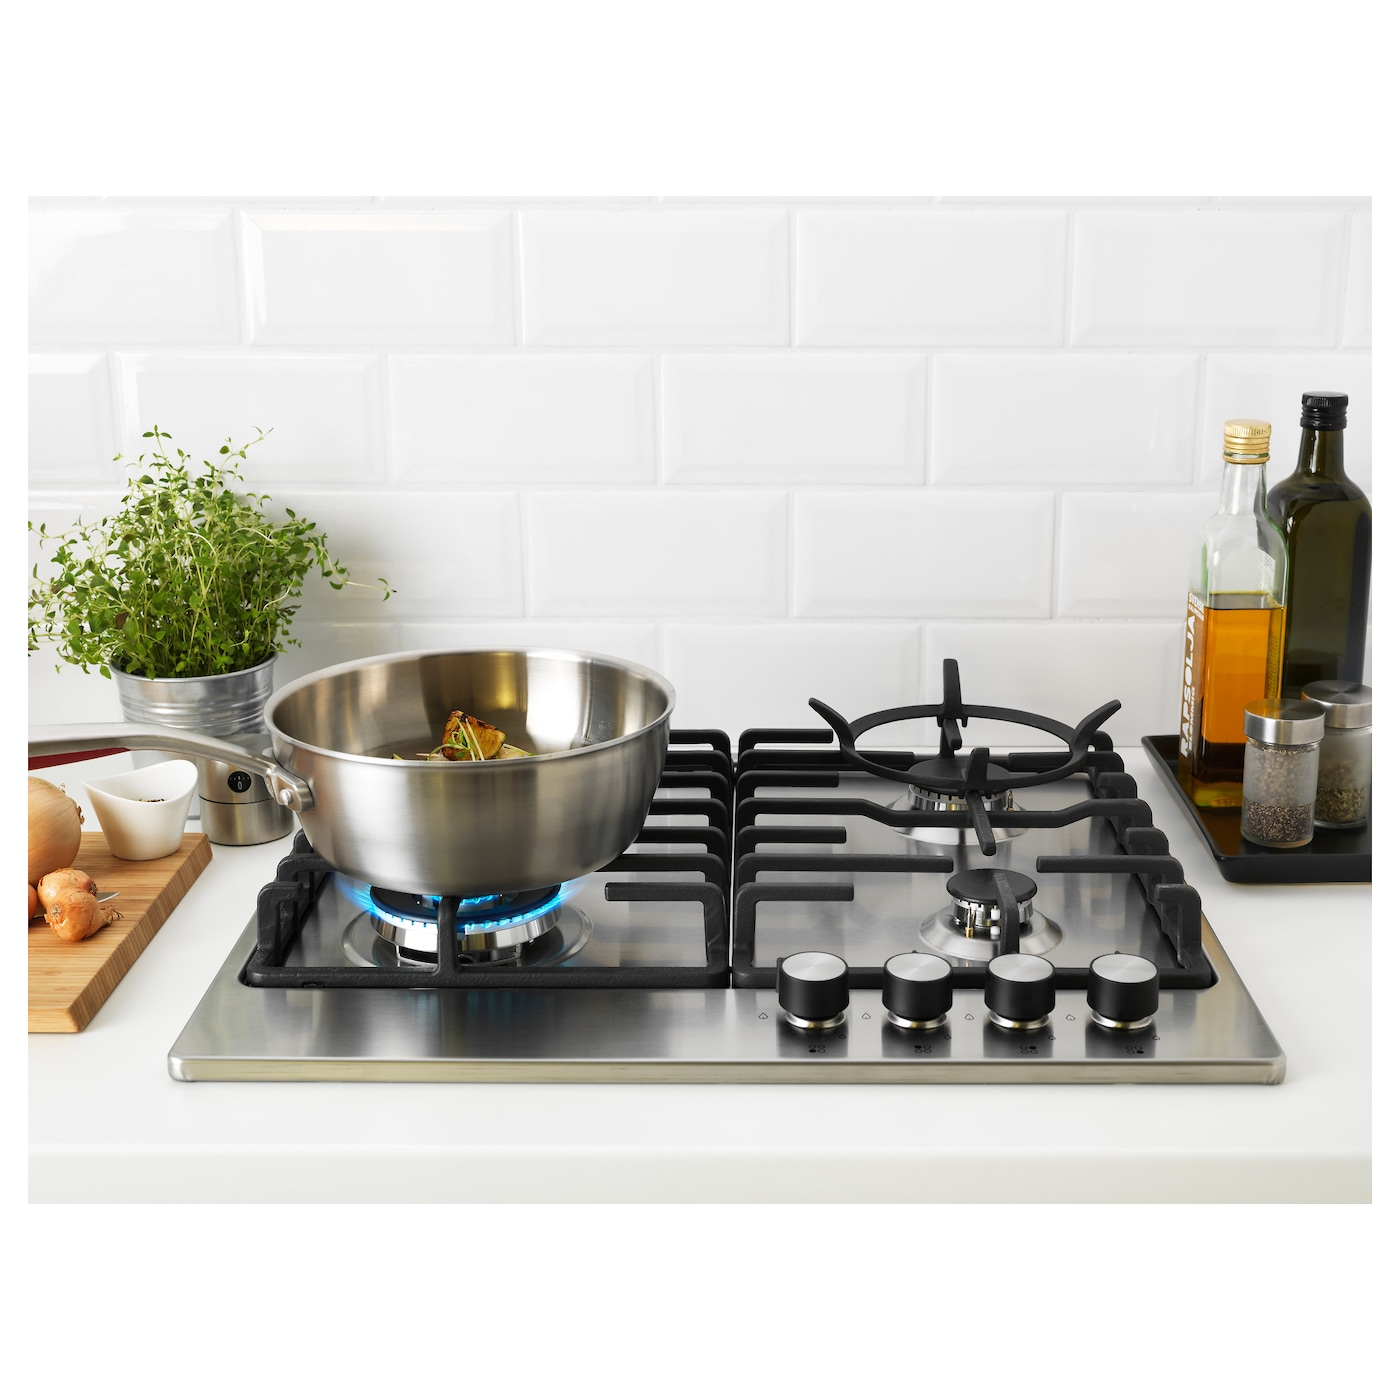 Kitchen Outlet Hob ~ LivslÅga gas hob stainless steel ikea